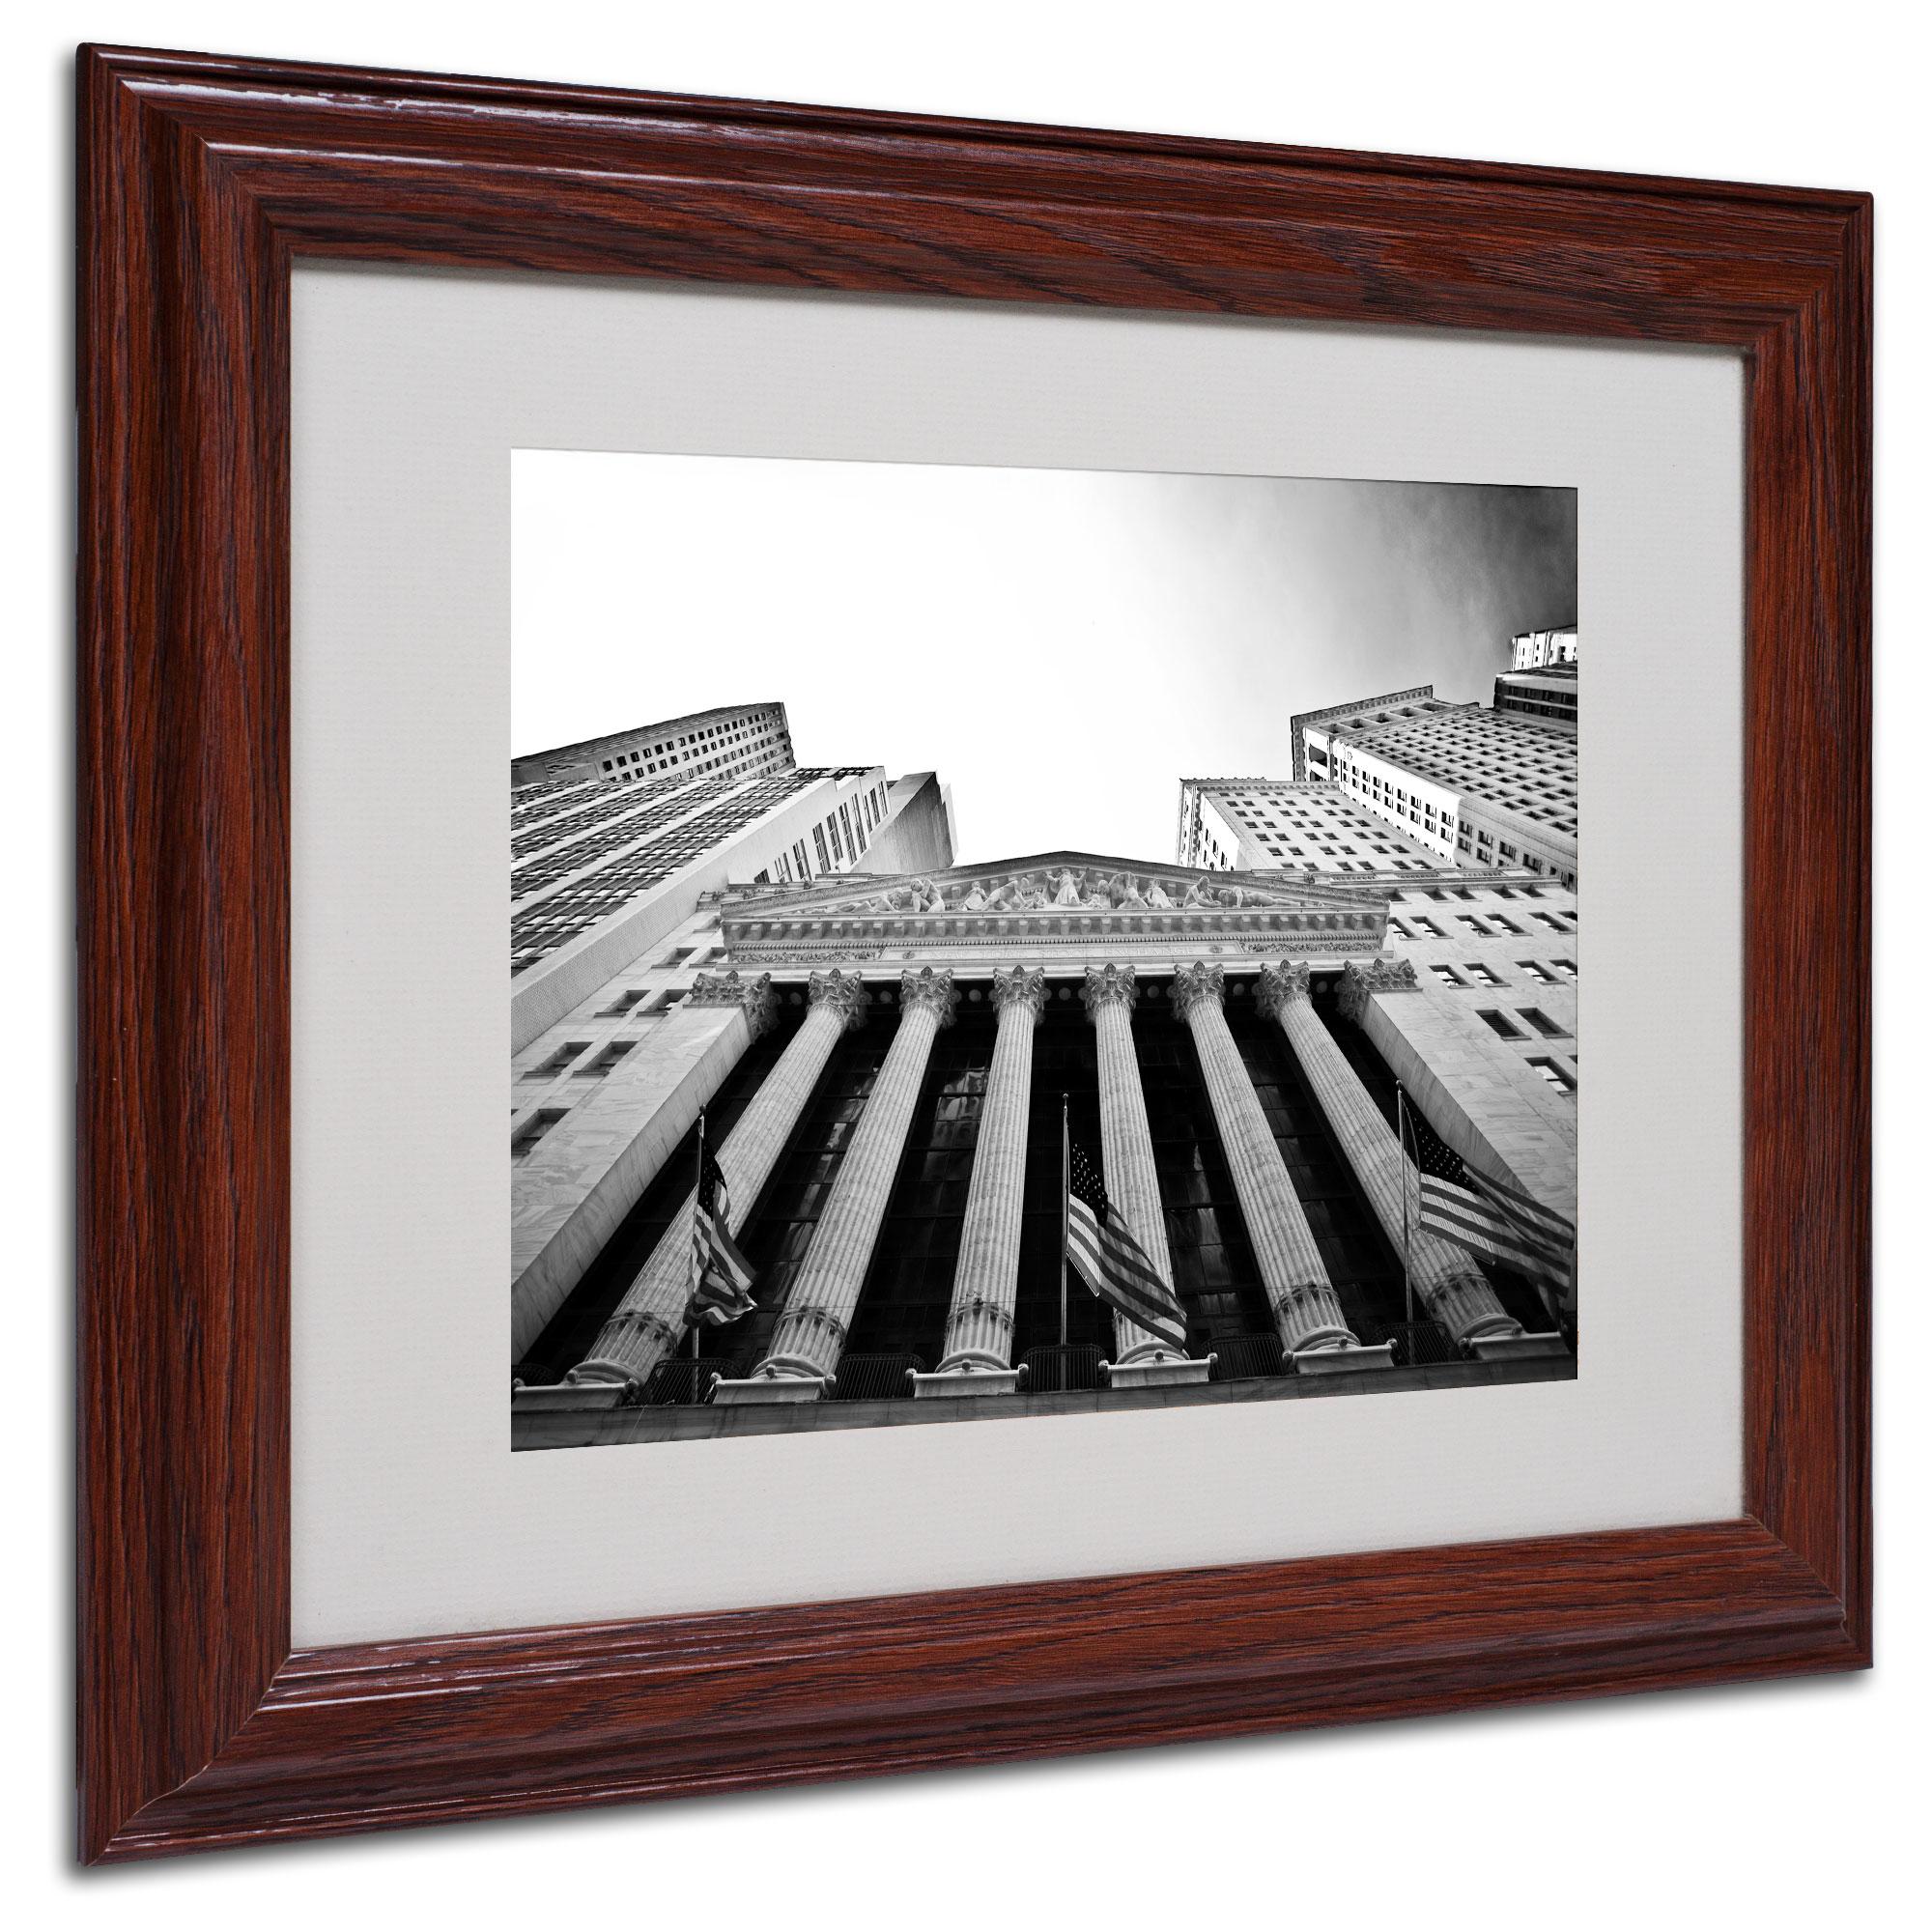 Trademark Fine Art Yale Gurney 'The New York Stock Exchange' Matted Framed Art PartNumber: 024VA70911012P MfgPartNumber: YG0003-W1114MF